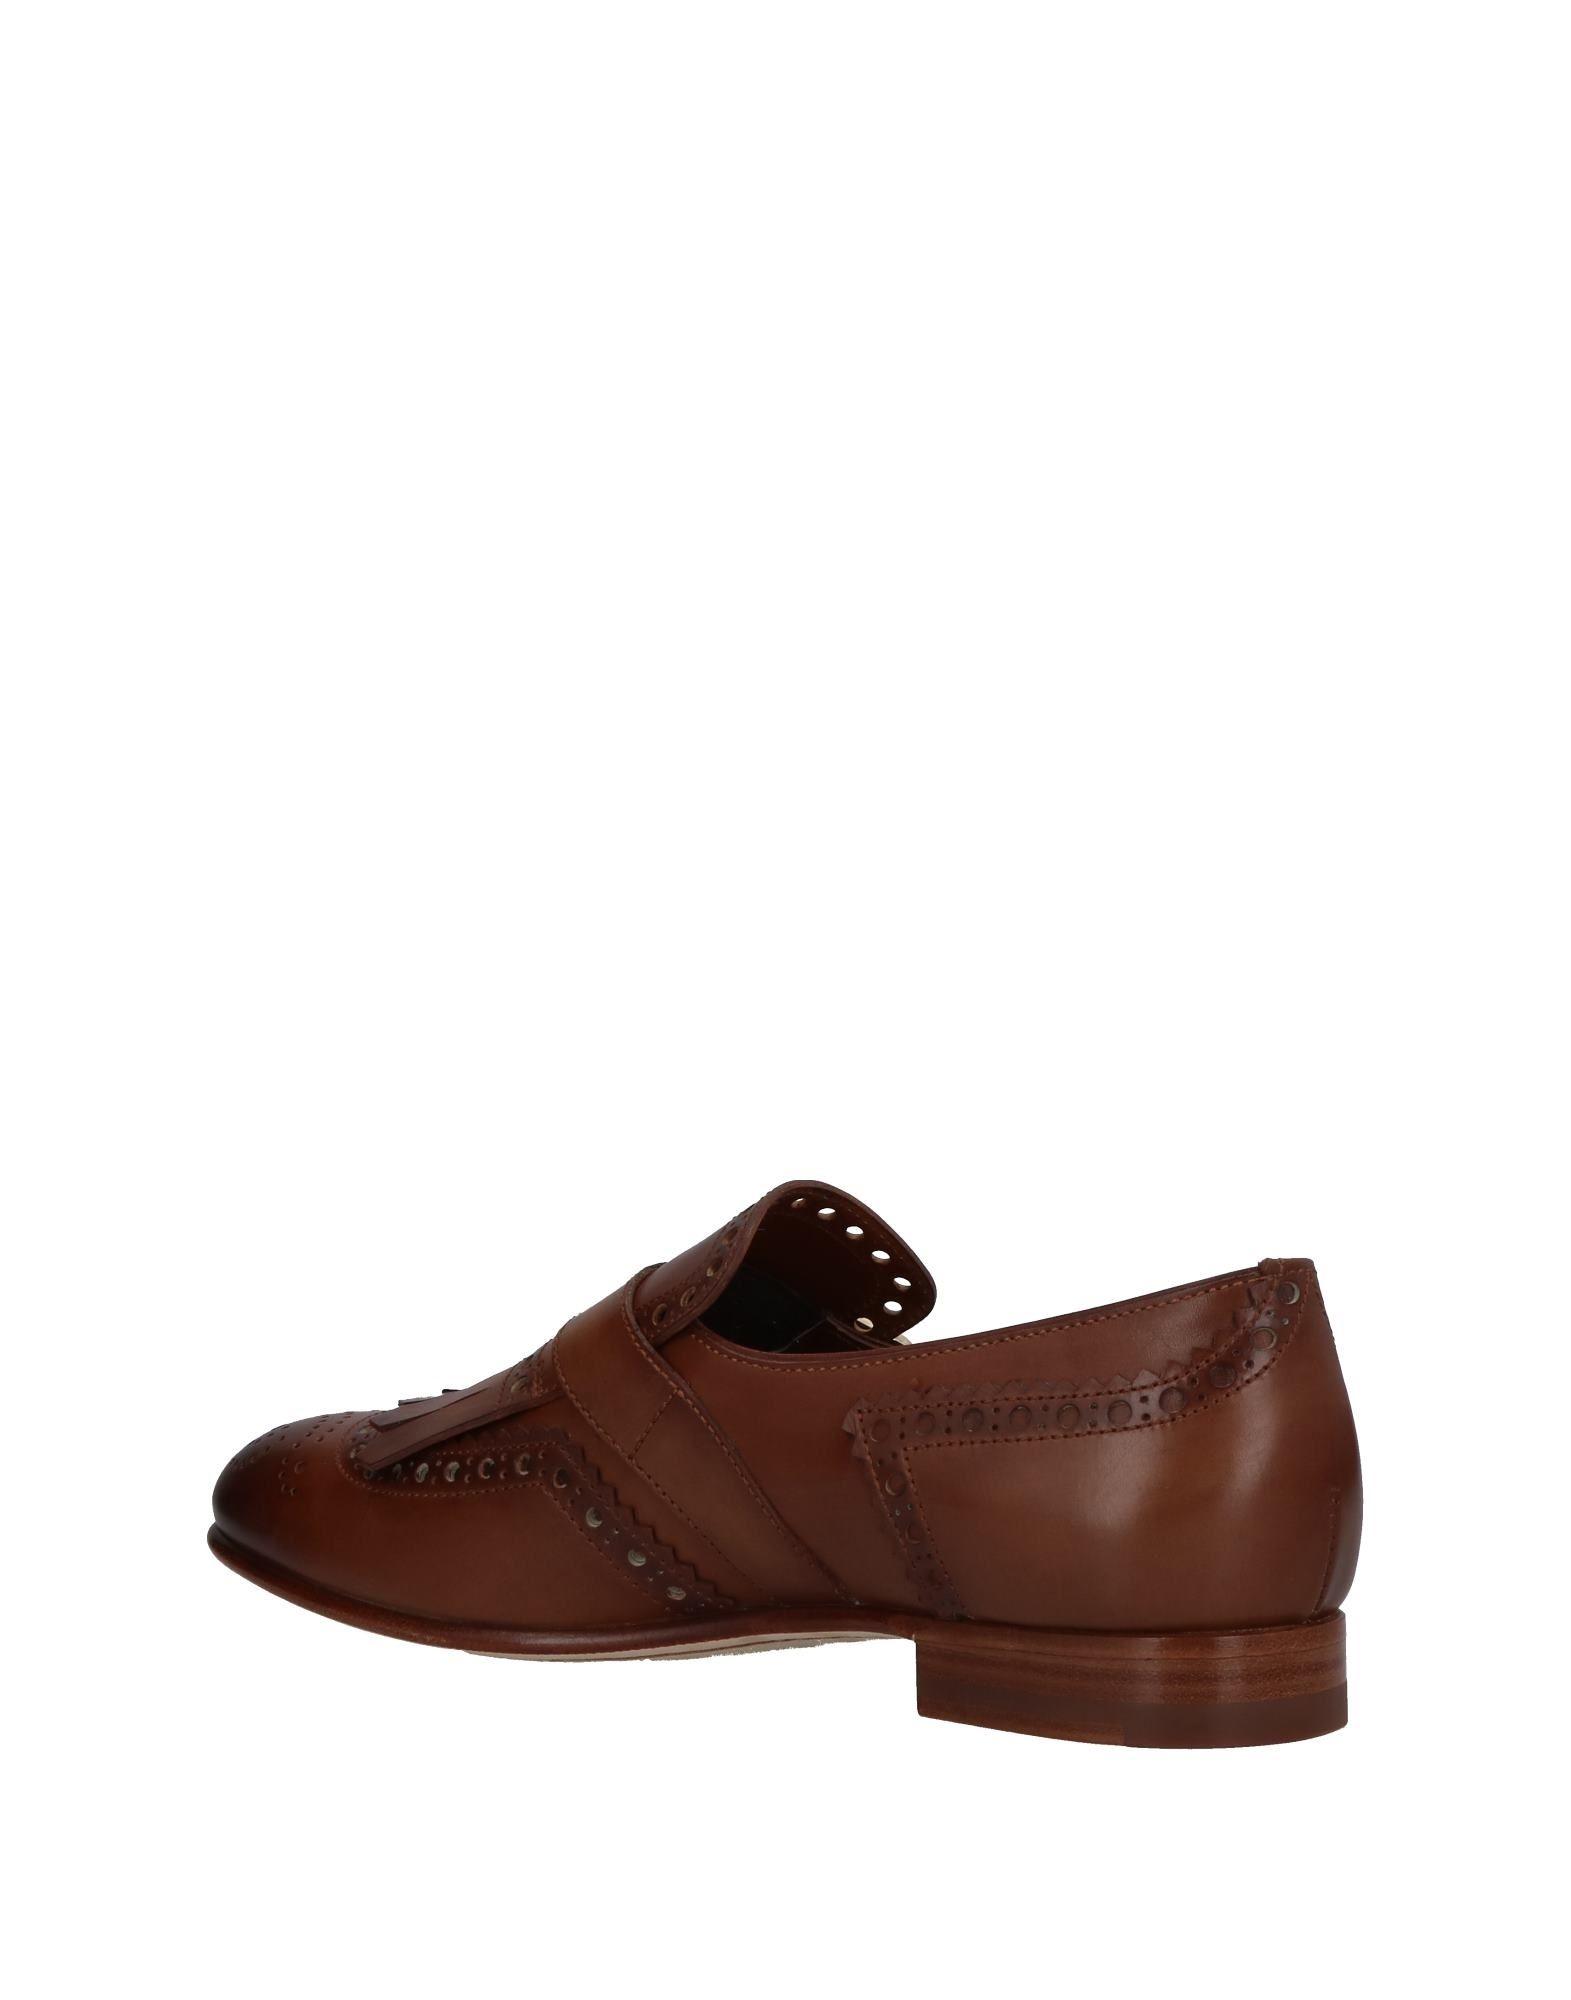 Rabatt Schuhe Santoni Mokassins Damen Damen Mokassins 11387200FL 02b30a